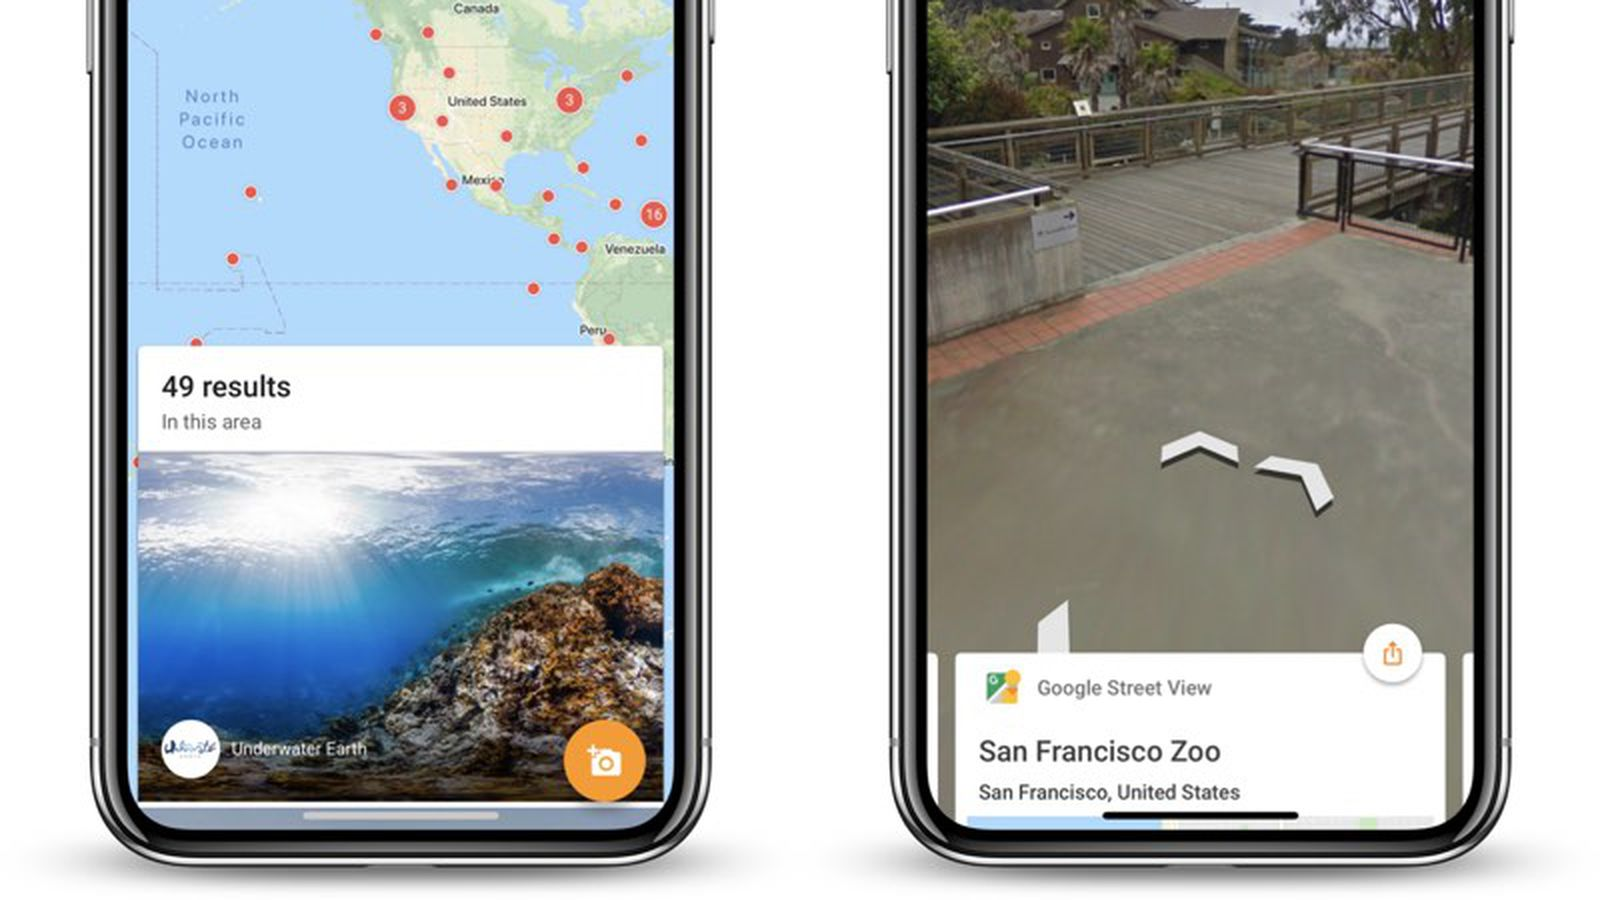 Google S Street View App For Ios Gets Iphone X Update Macrumors